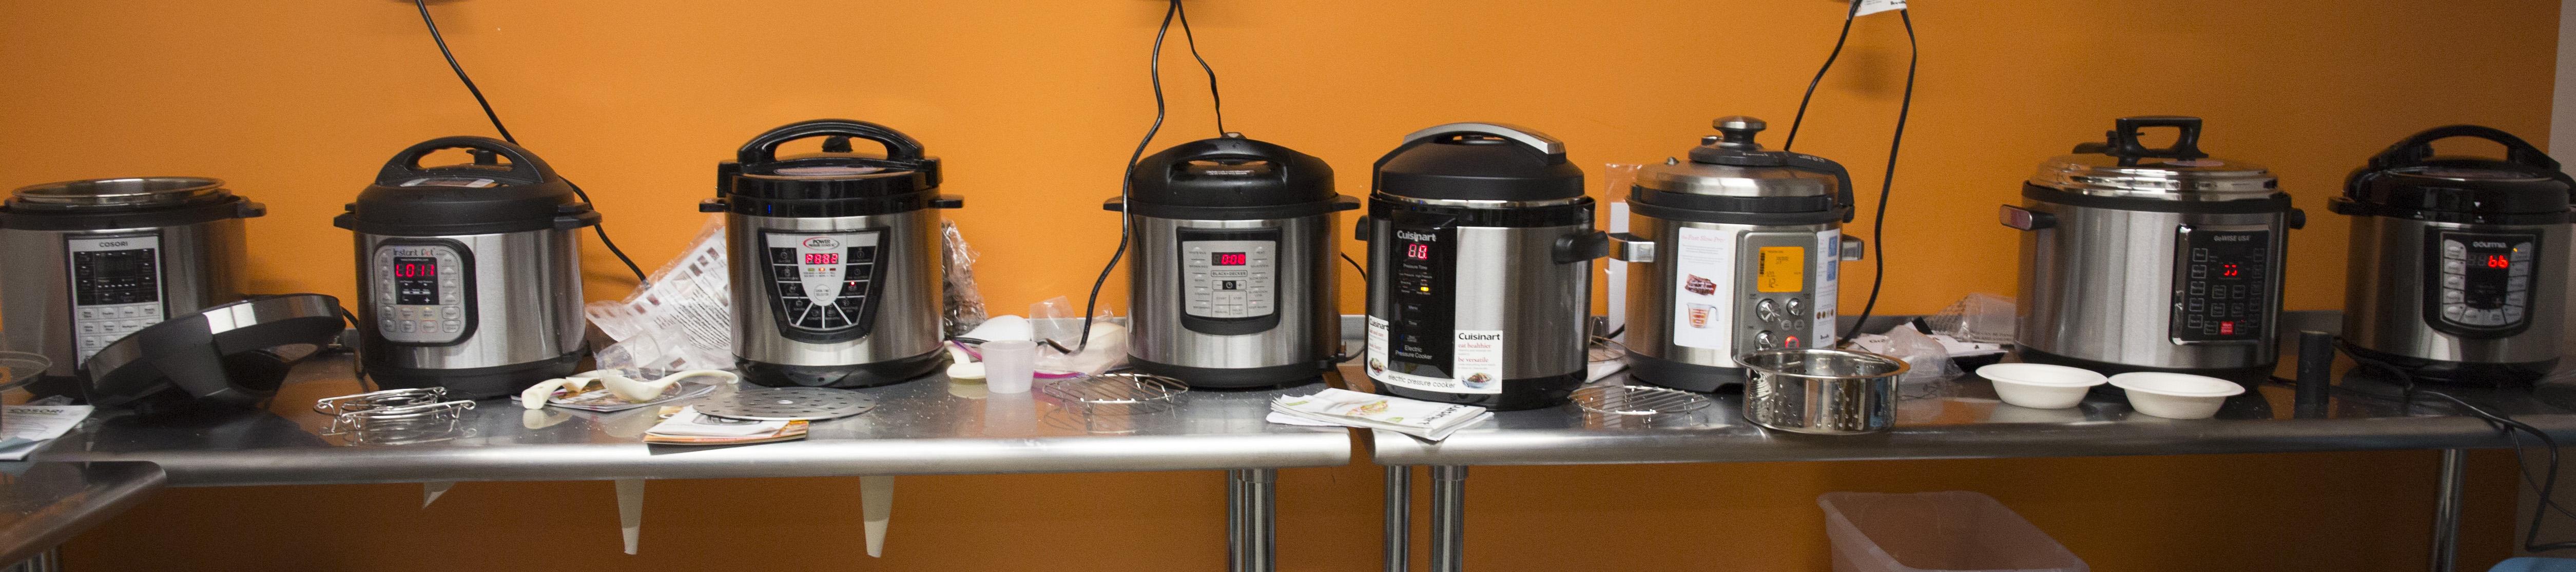 Best Pressure Cookers 2019 - Instant Pot vs  Power Pressure